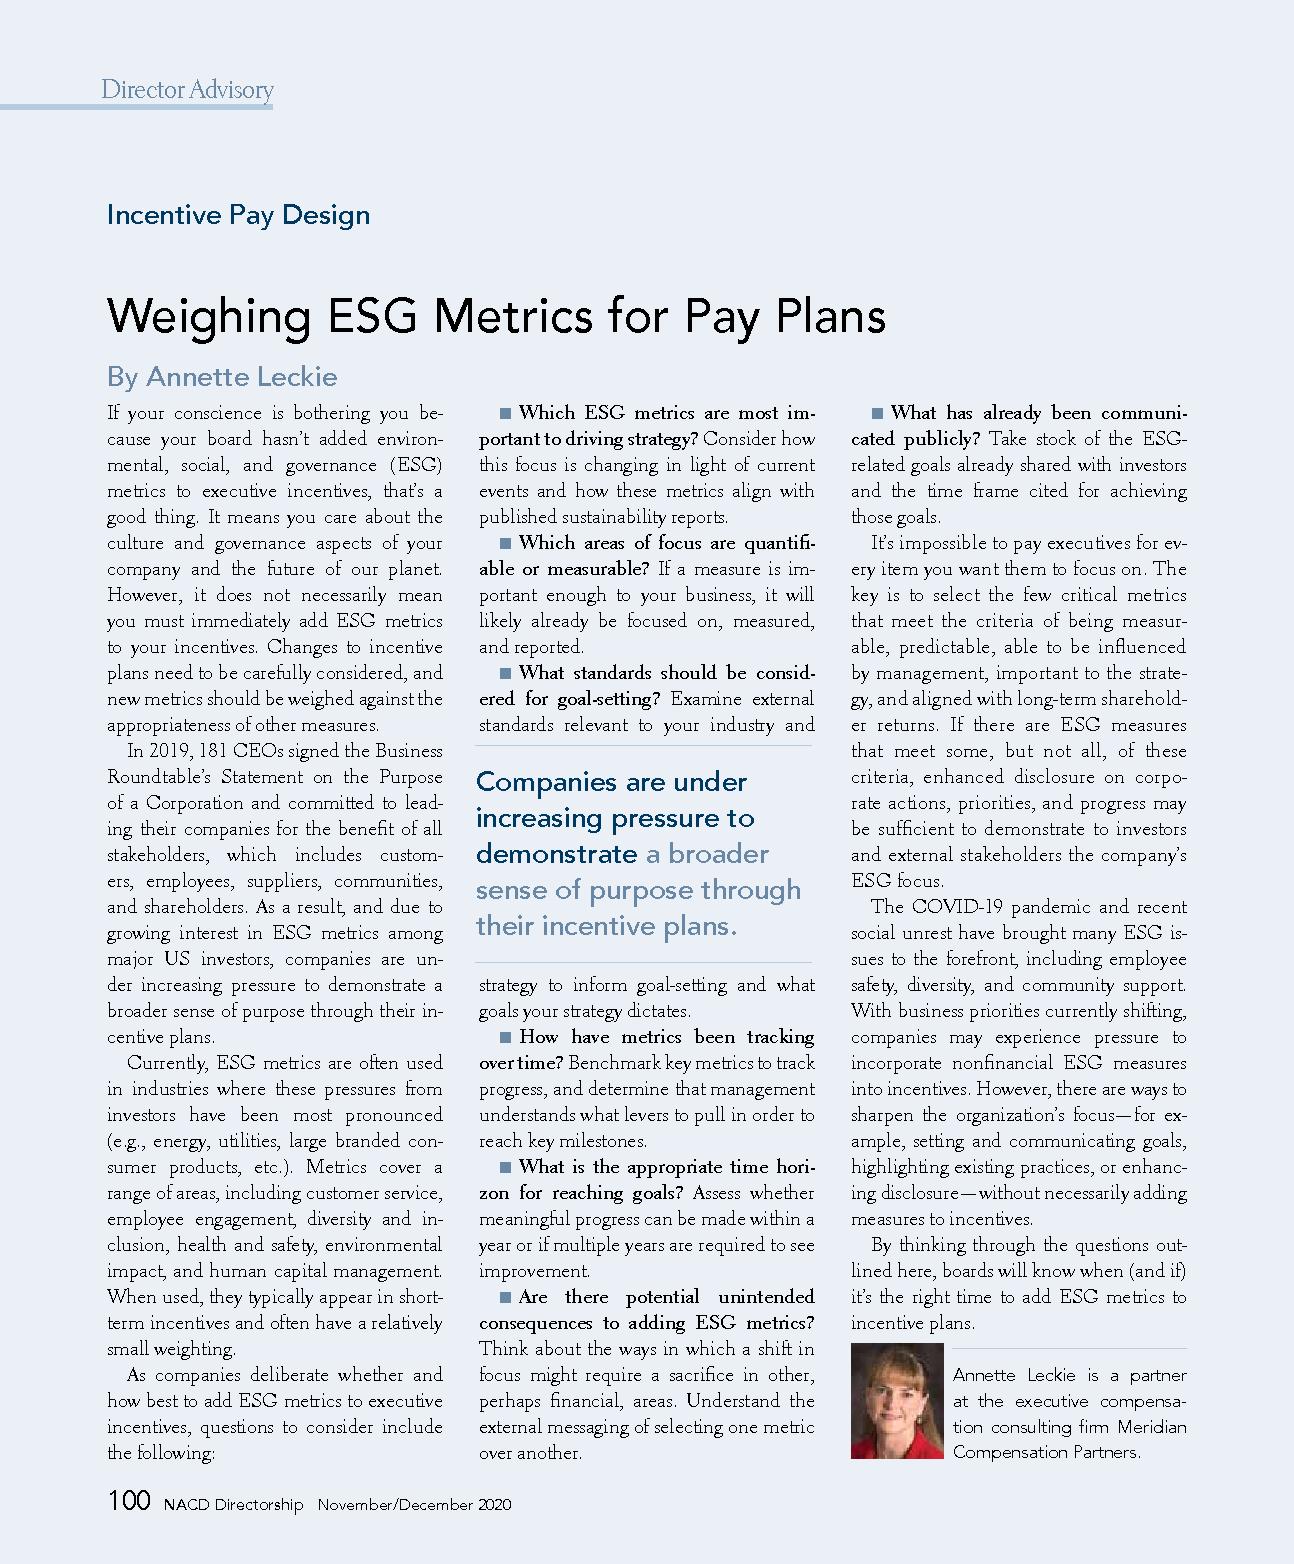 Weighing ESG Metrics for Pay Plans (PDF)